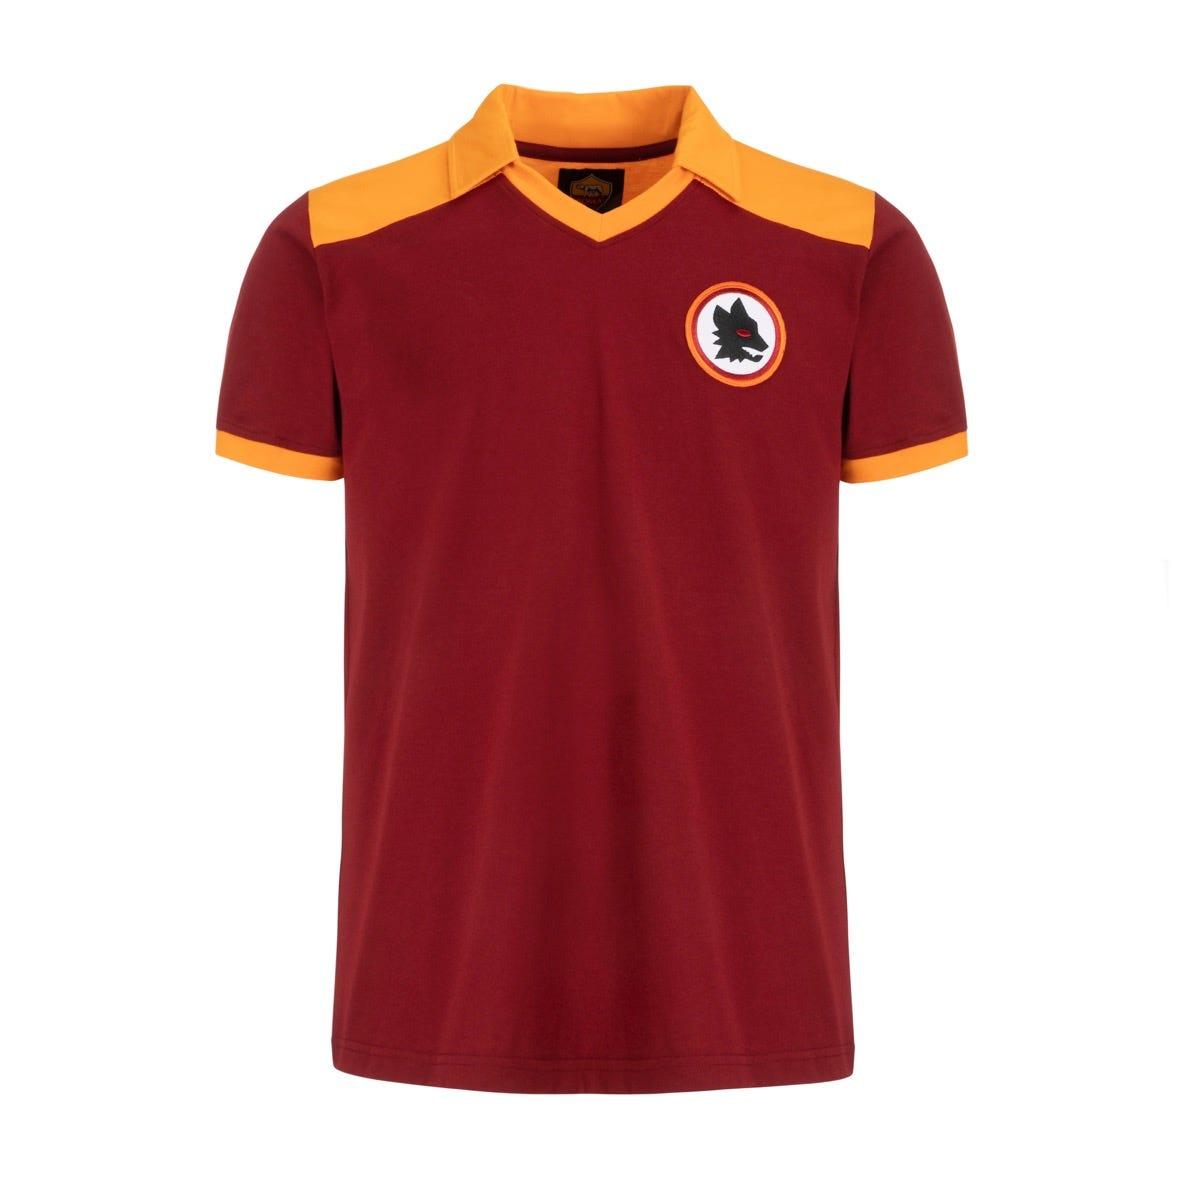 Men's AS ROMA Retro 1980 short-sleeved jersey – red